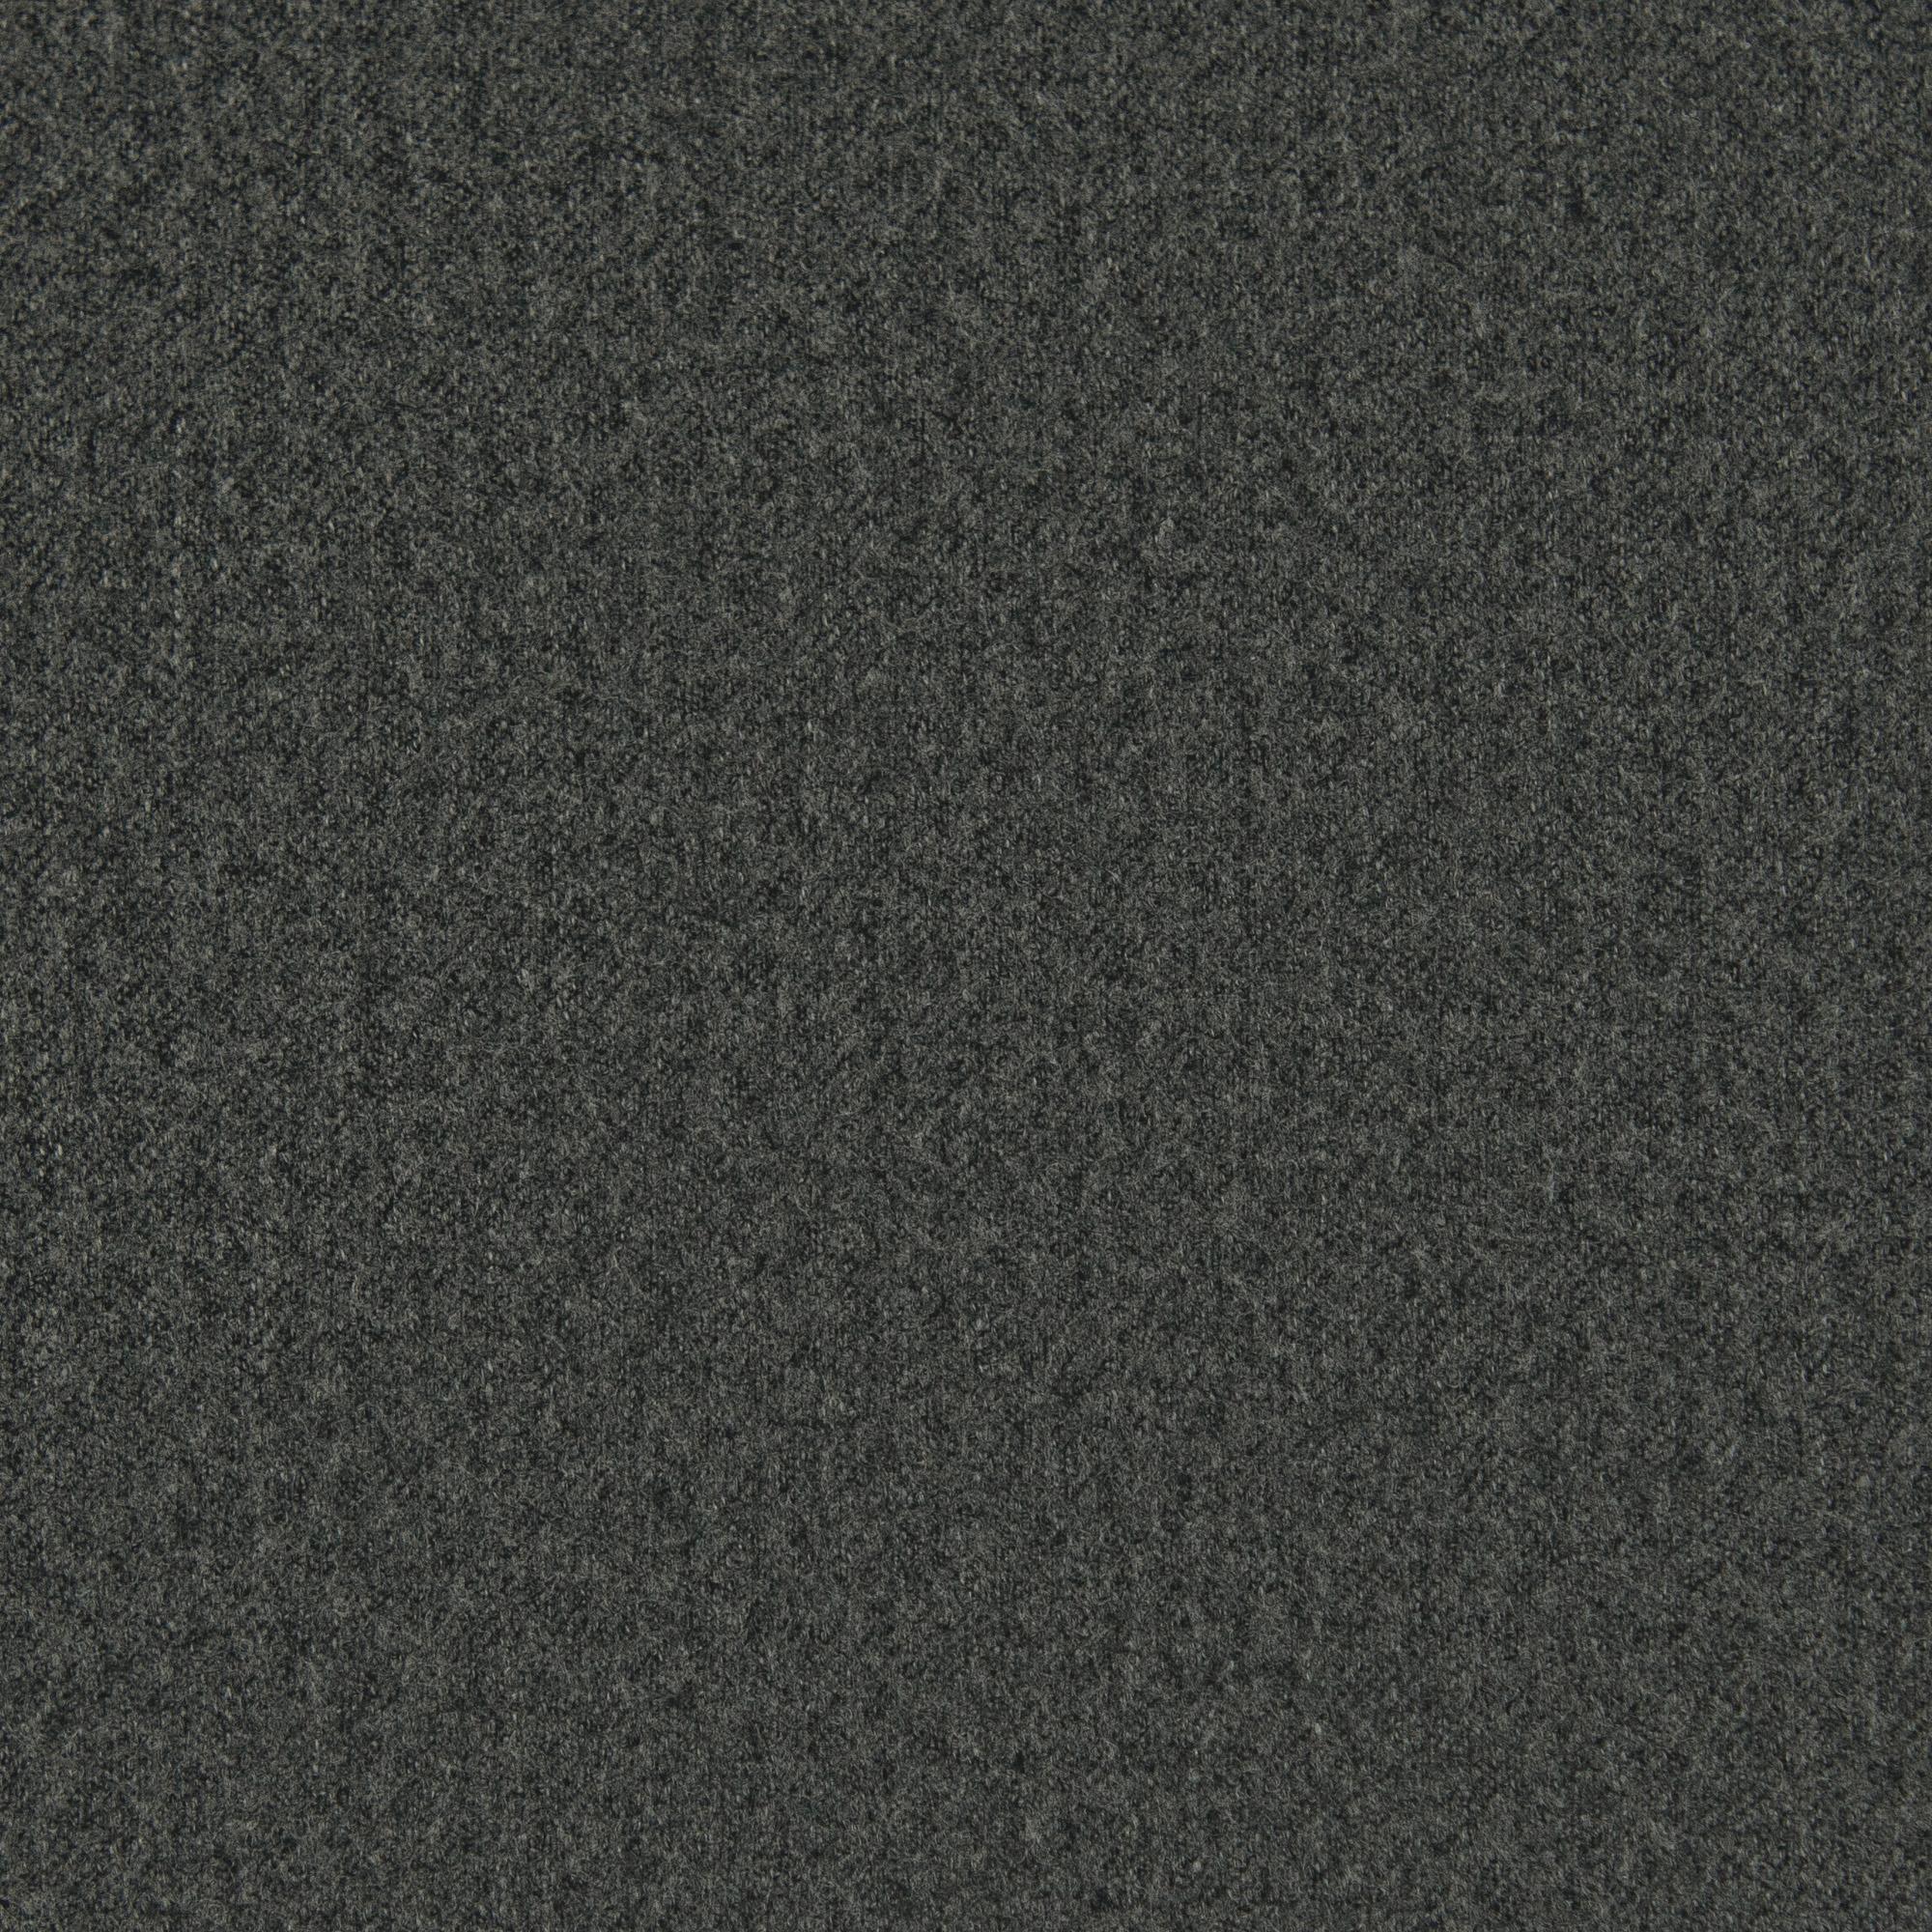 Sz1712010 1